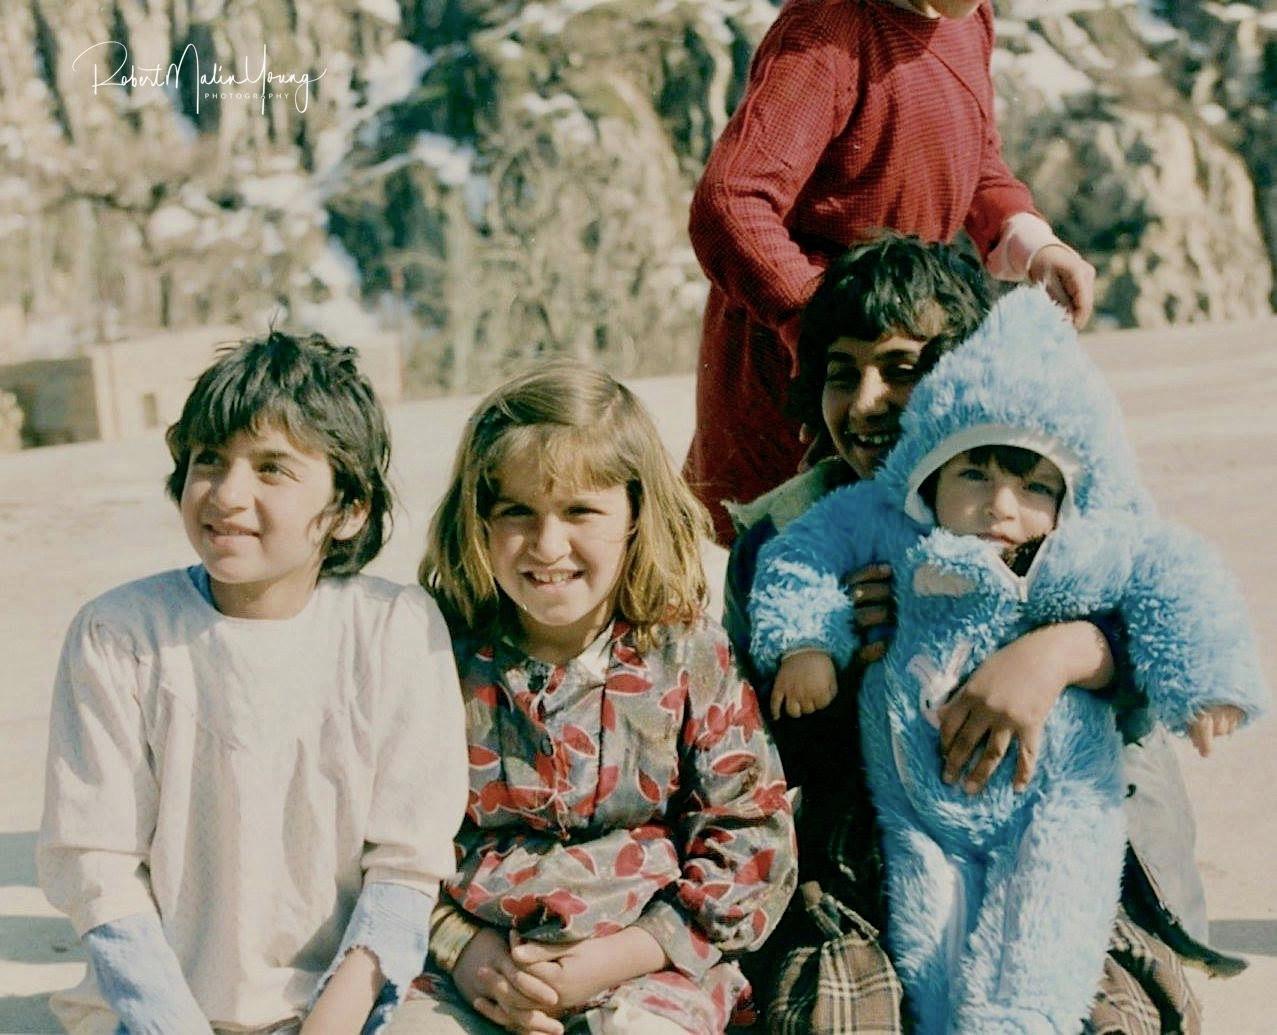 Kurdistan 1992 by Robert Malin Young